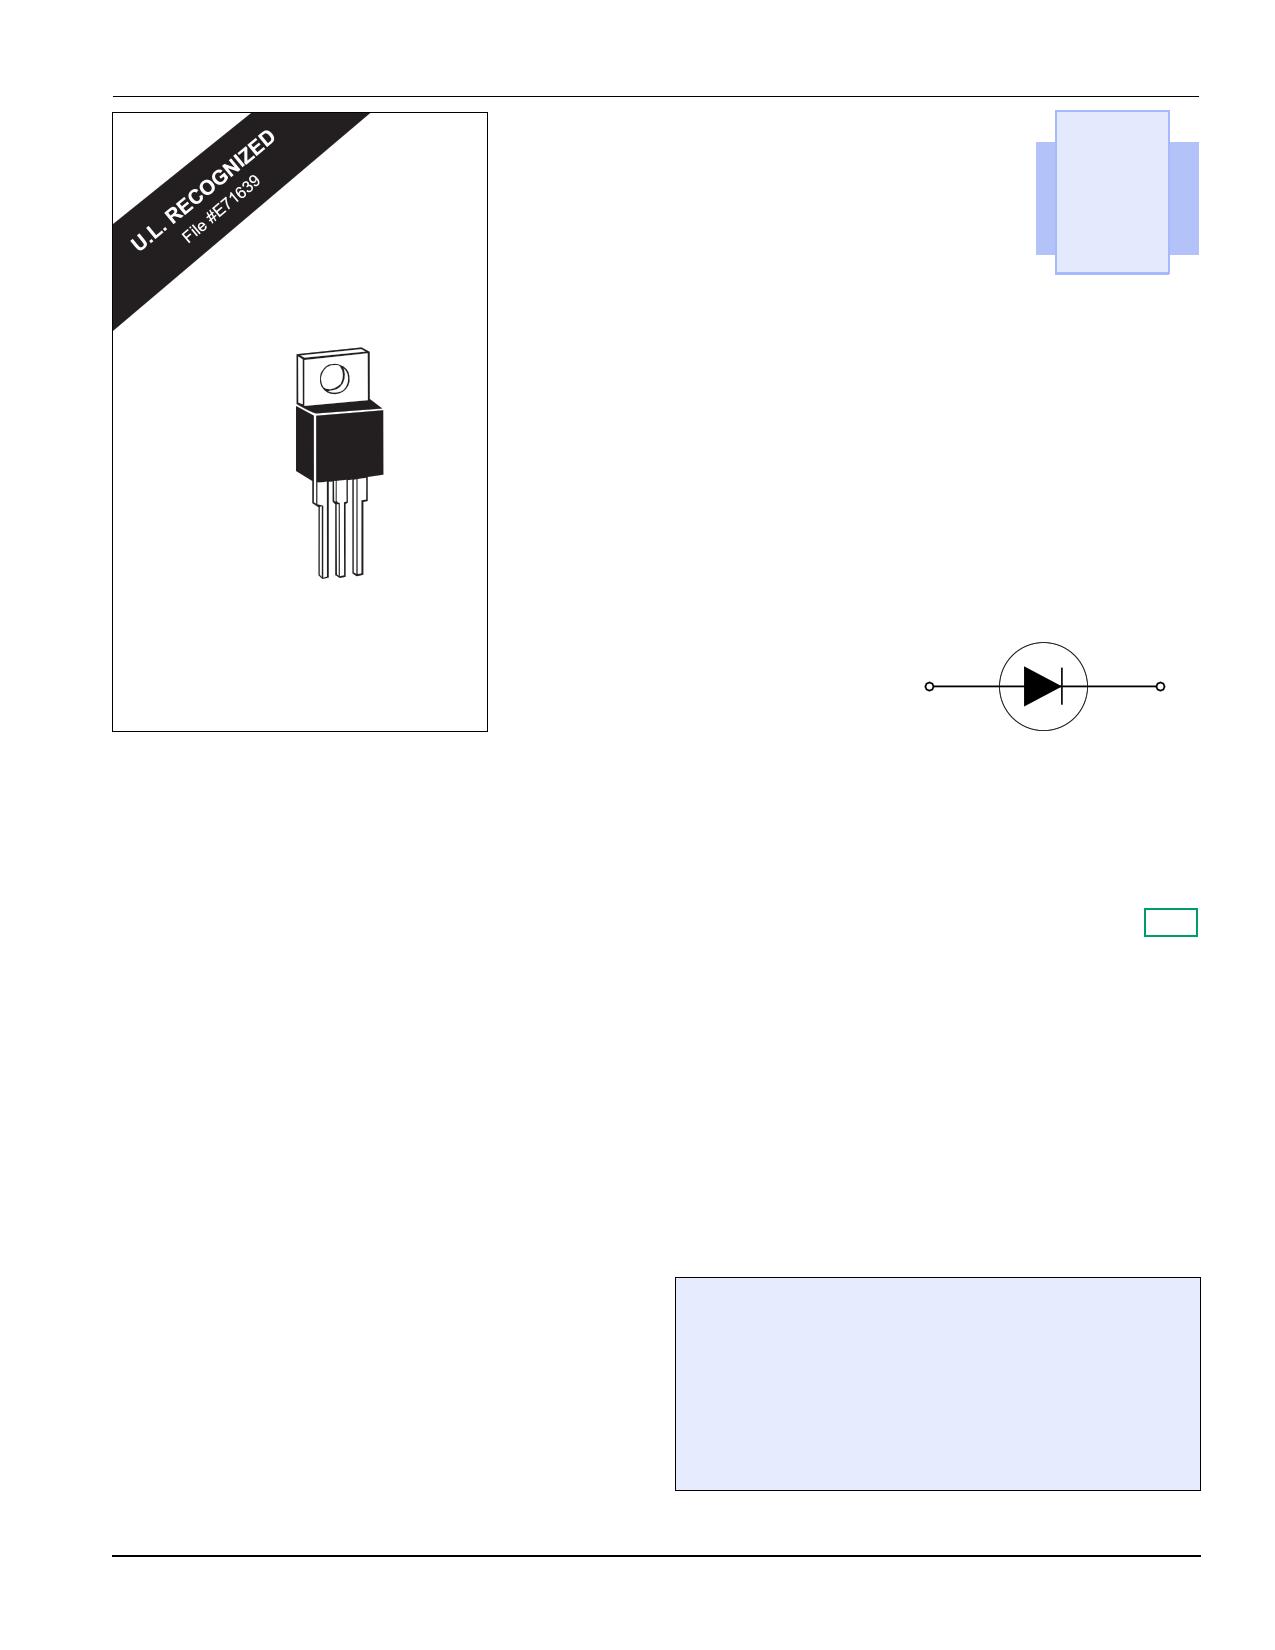 D2020L datasheet